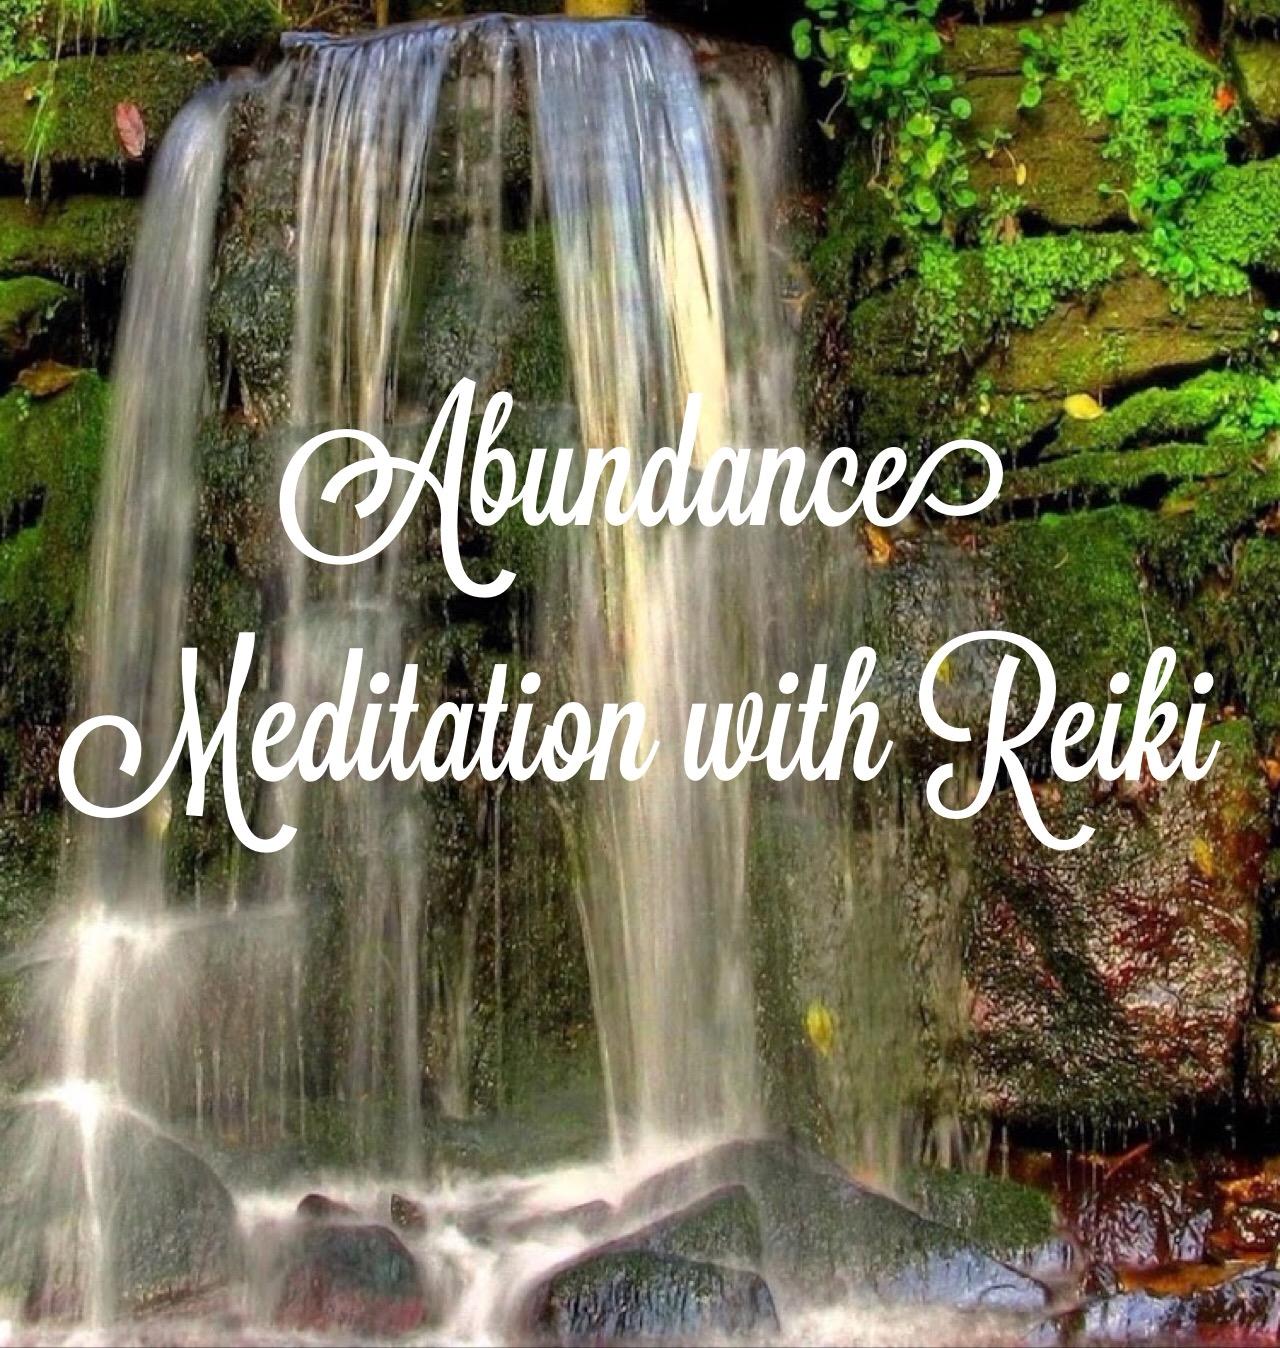 Abundance Meditation with Reiki - Blended Insight